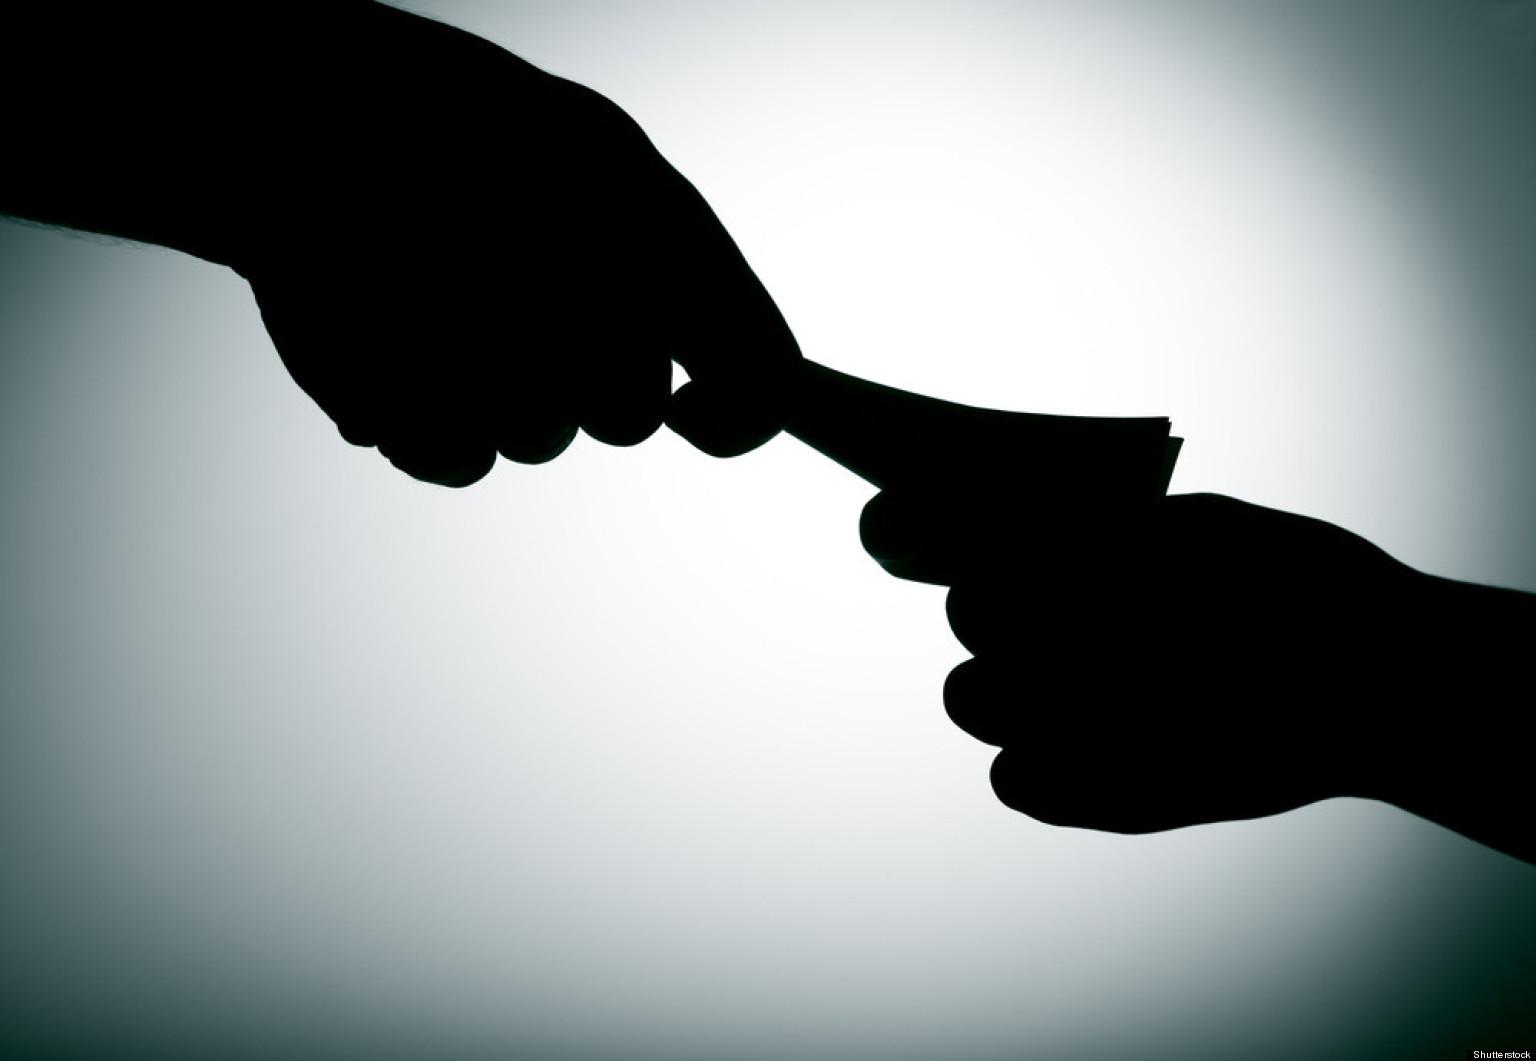 Lobbying and Corruption